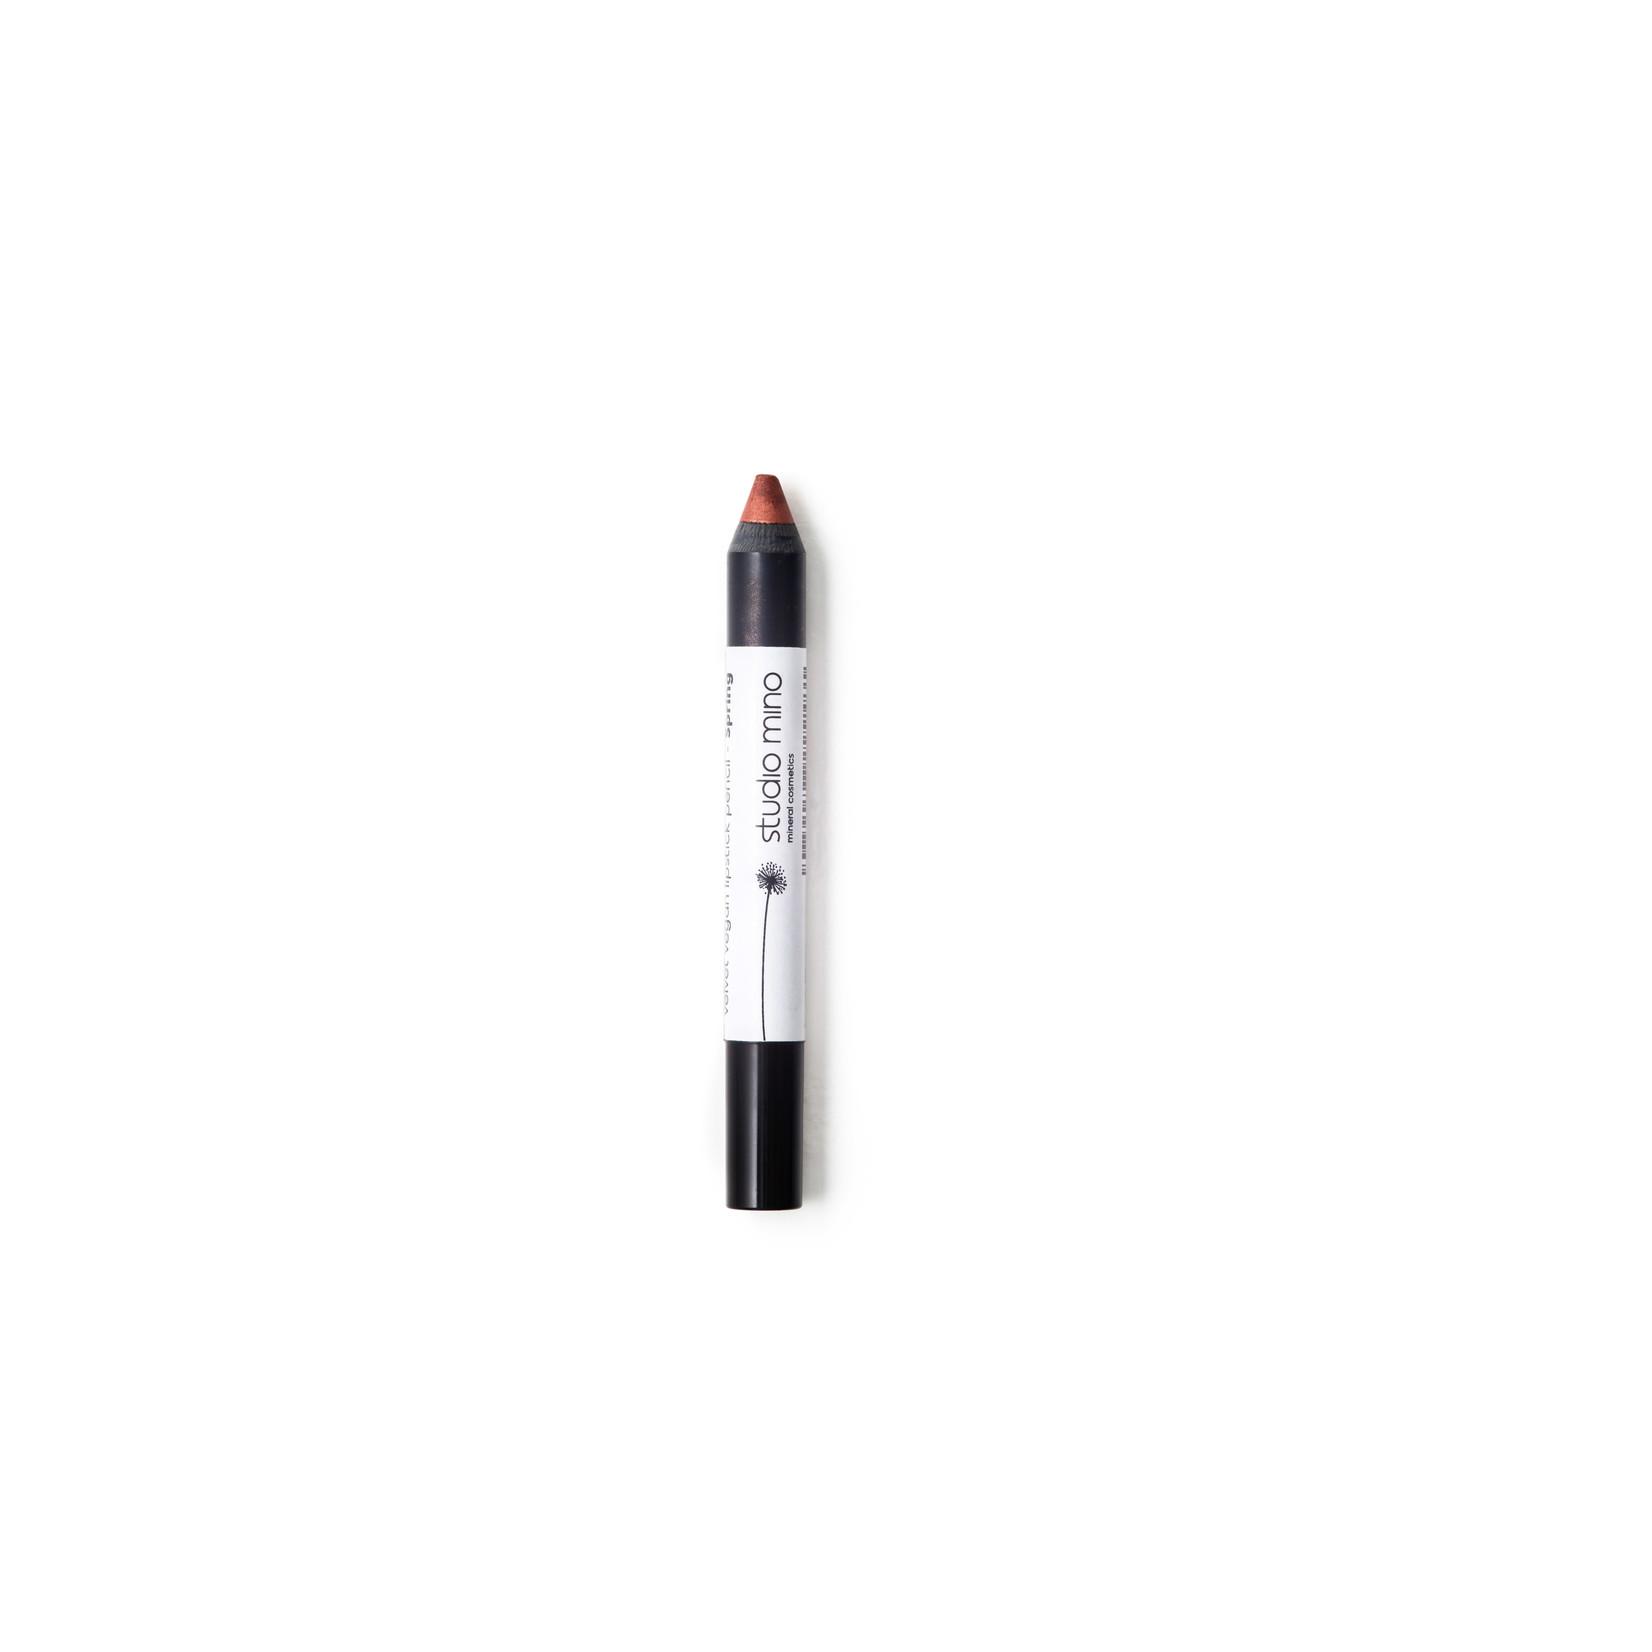 Studio mino Velvet Vegan Lipstick Potlood Spring